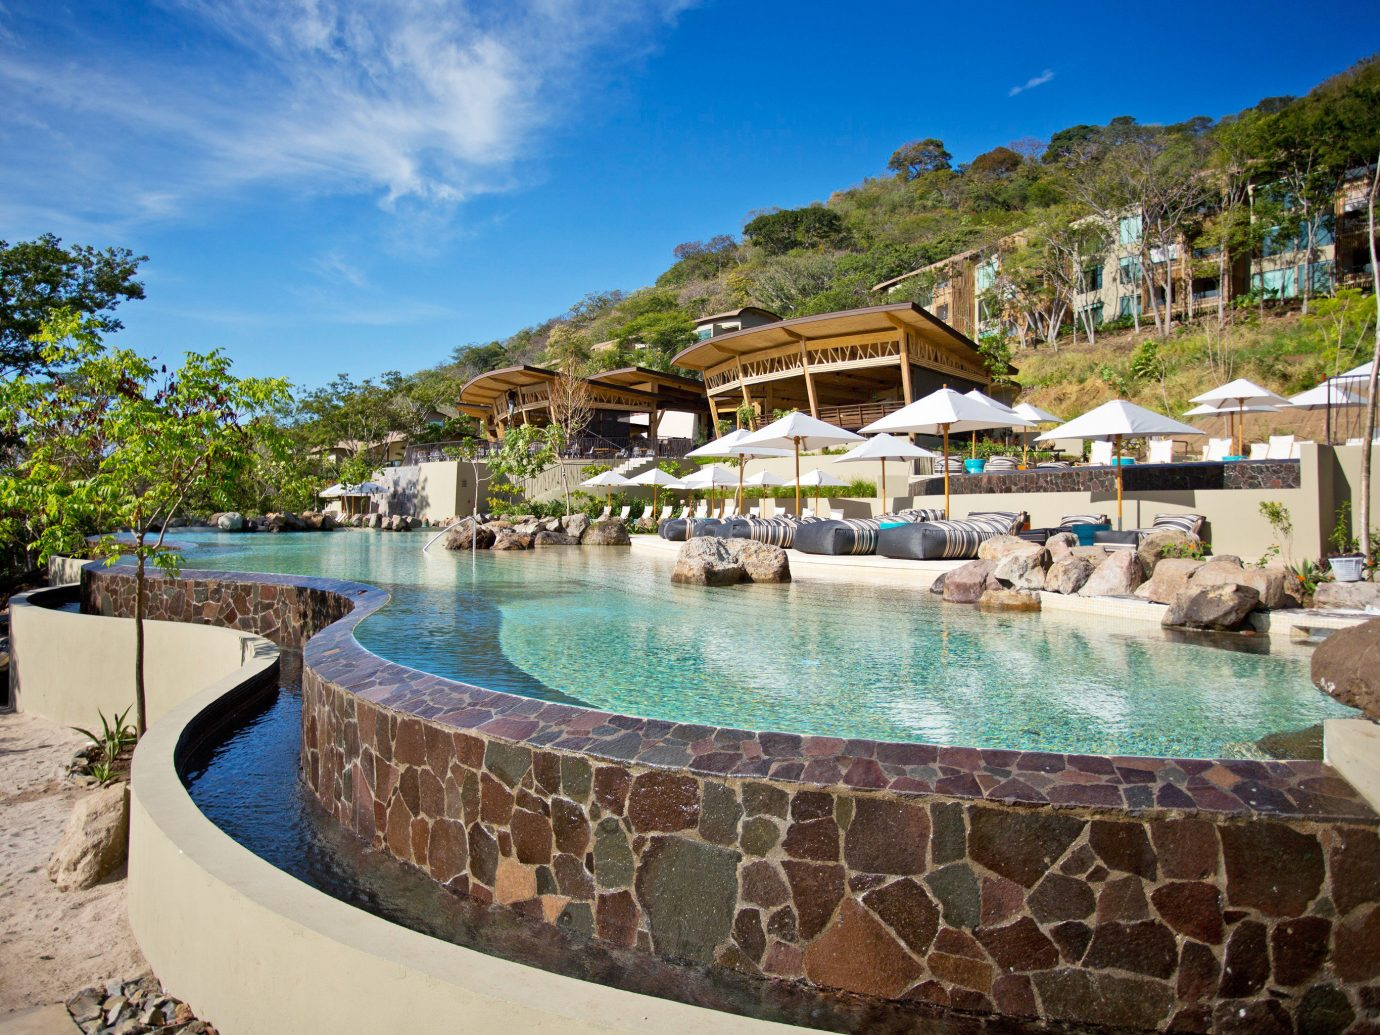 Pool At Andaz Peninsula Papagayo Resort In Costa Rica